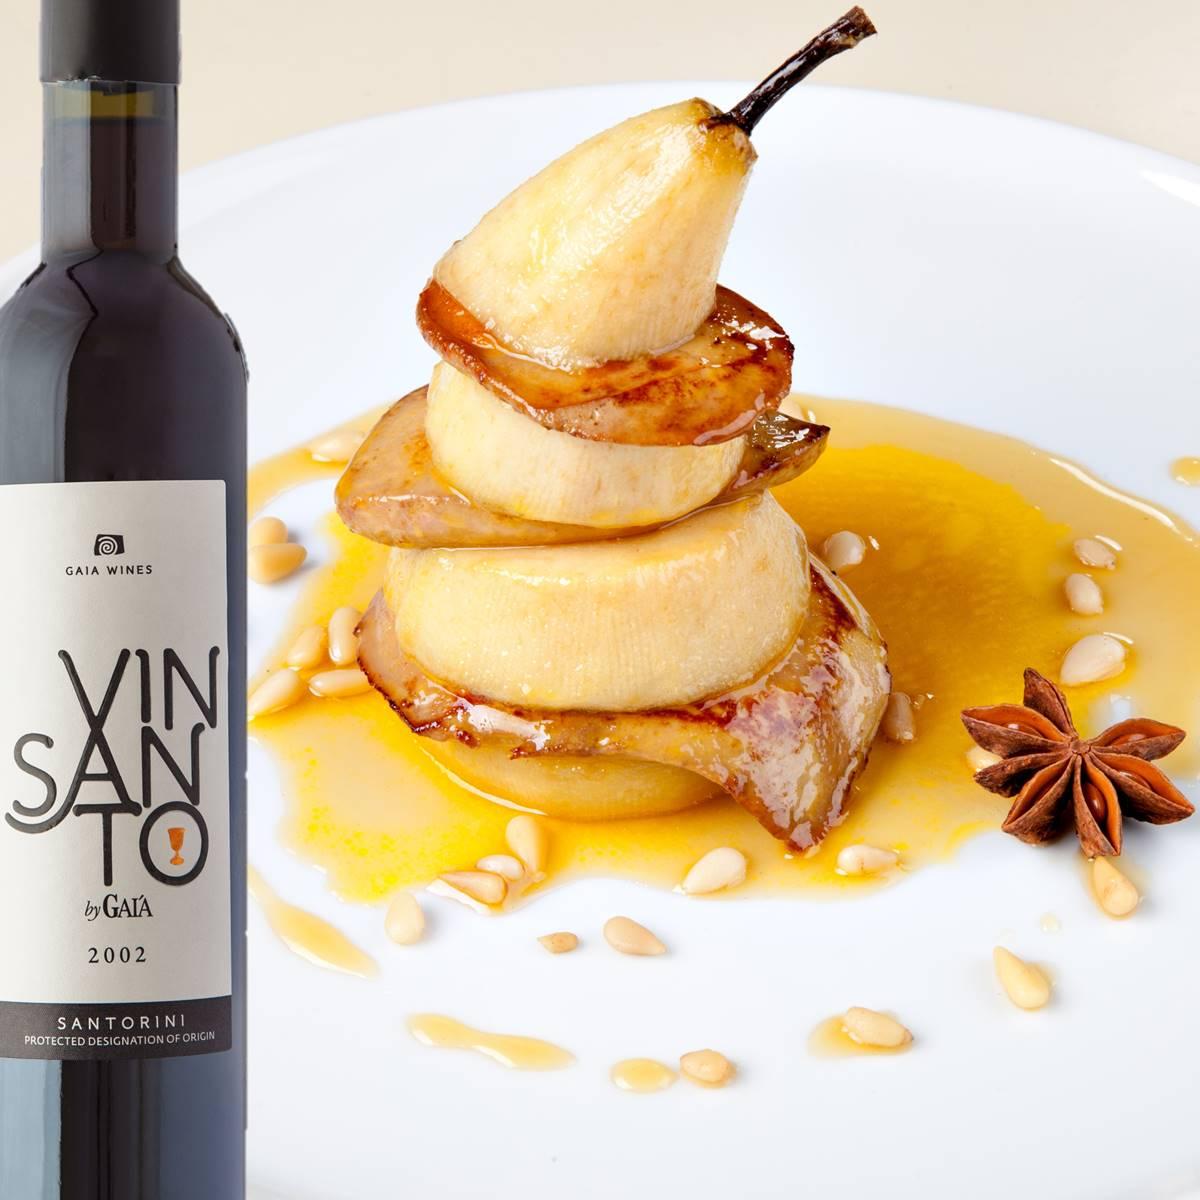 Wine Pairing VINSANTO - Gaia Wines